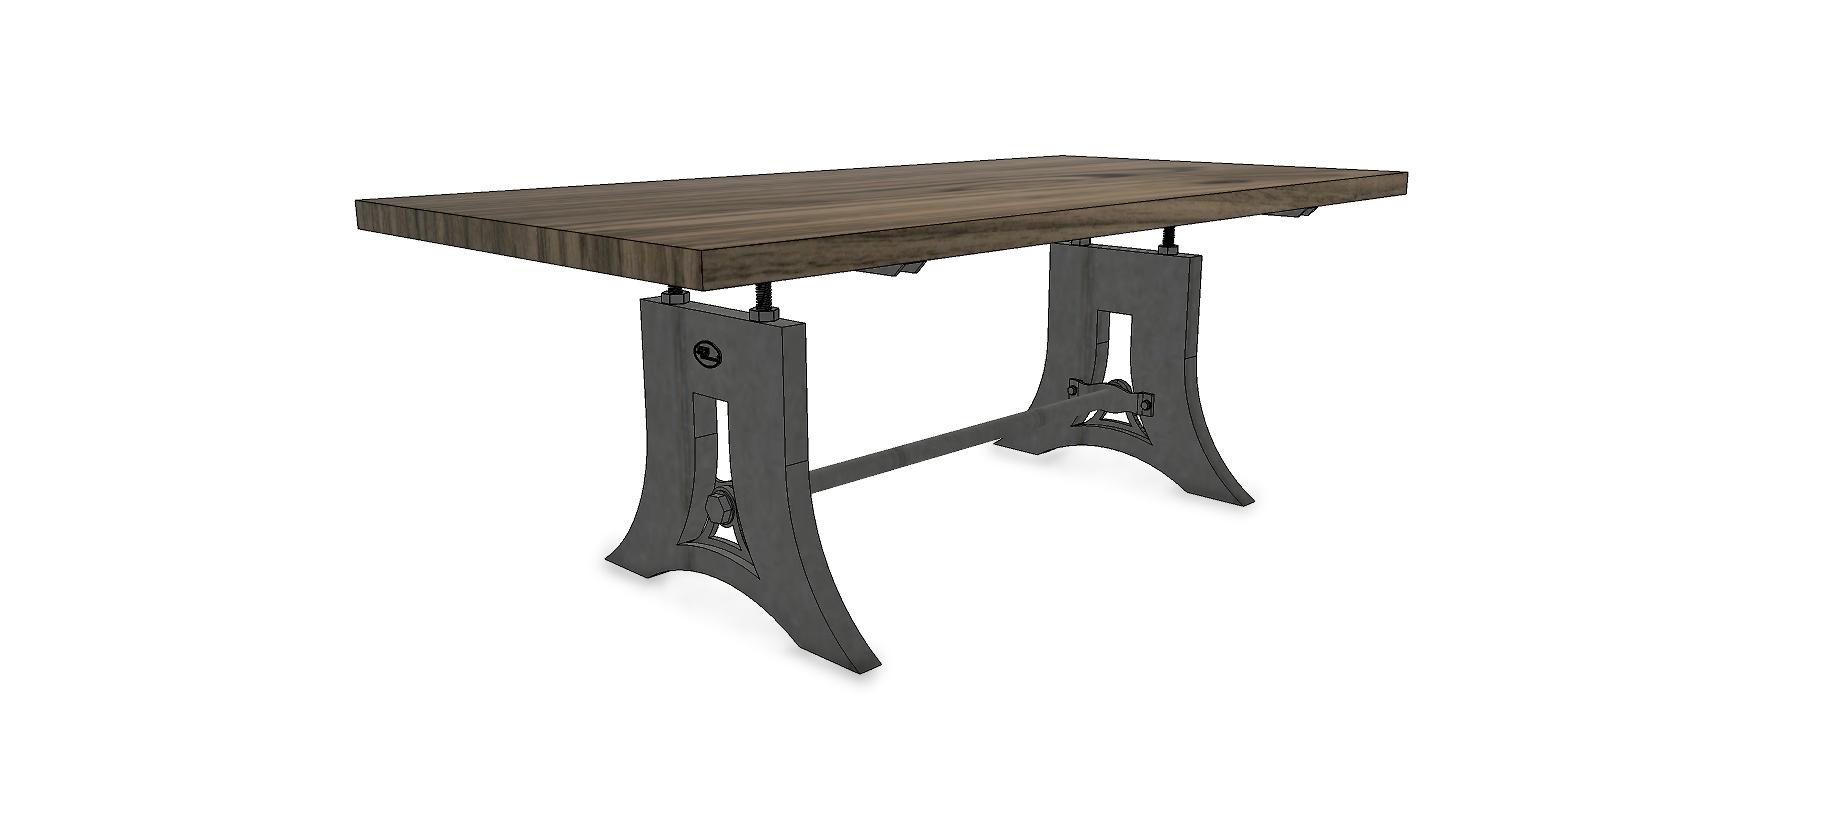 Table industrielle Acme